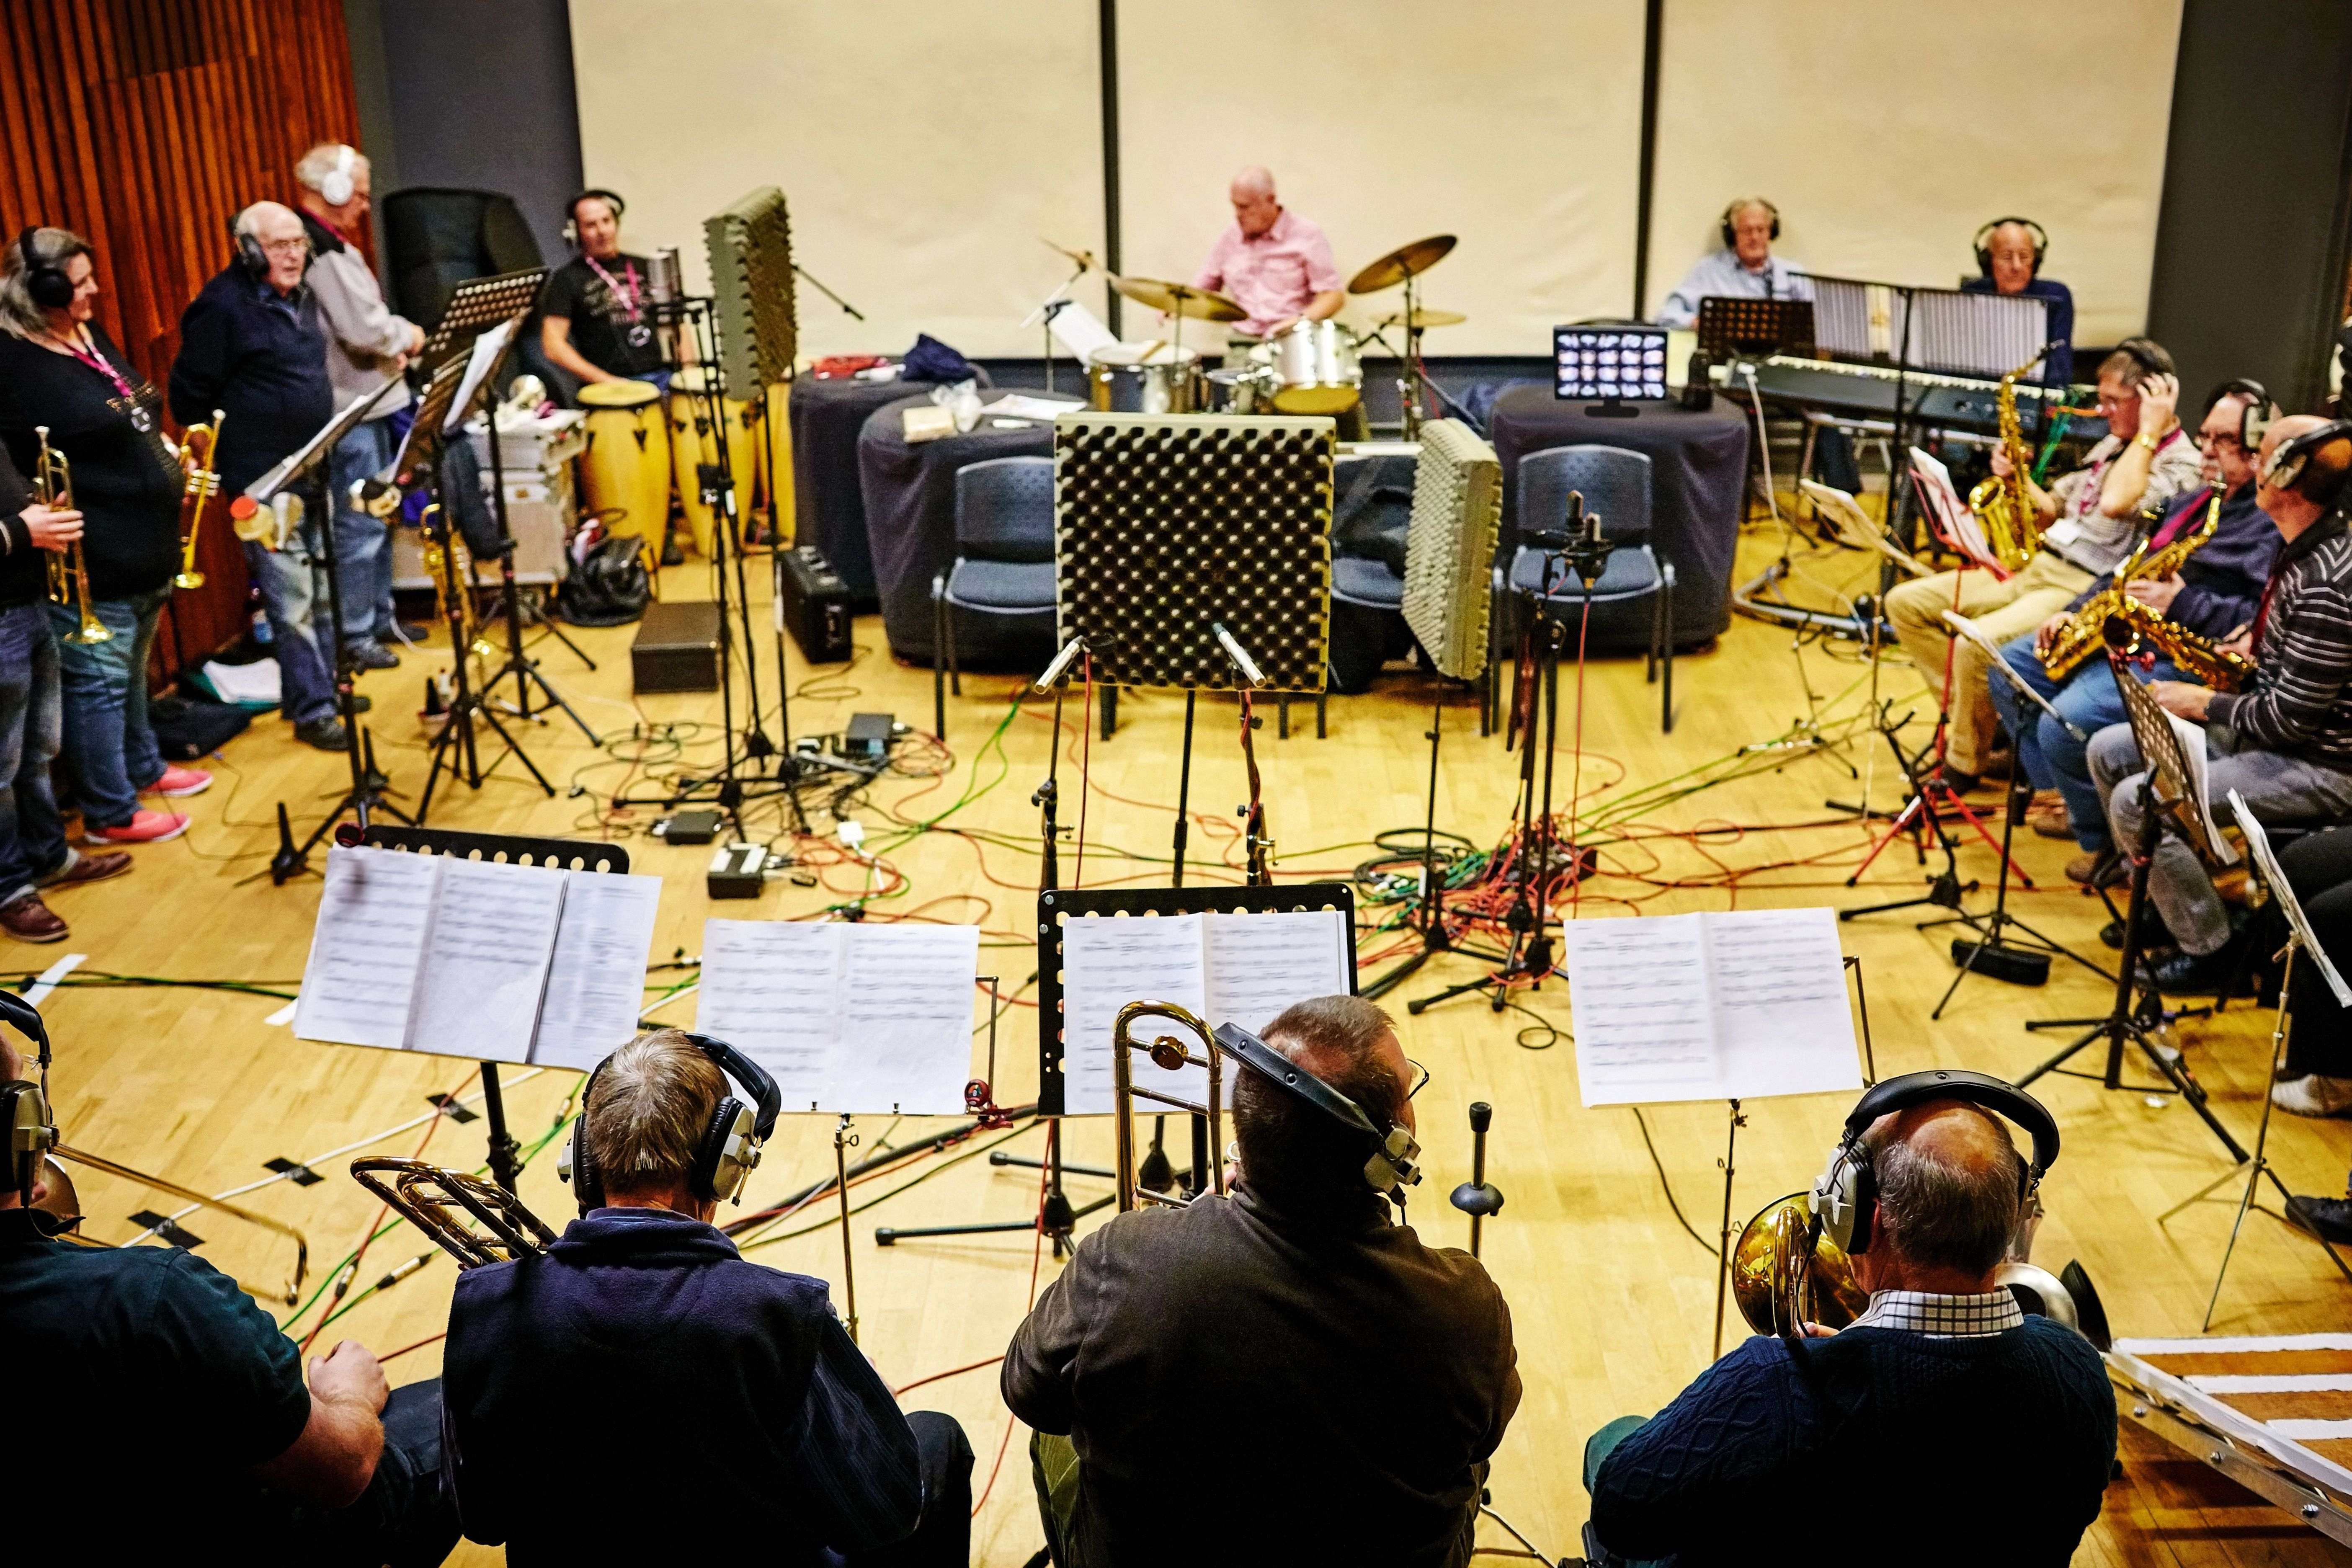 Session Musician Job : session musician career profile ~ Russianpoet.info Haus und Dekorationen